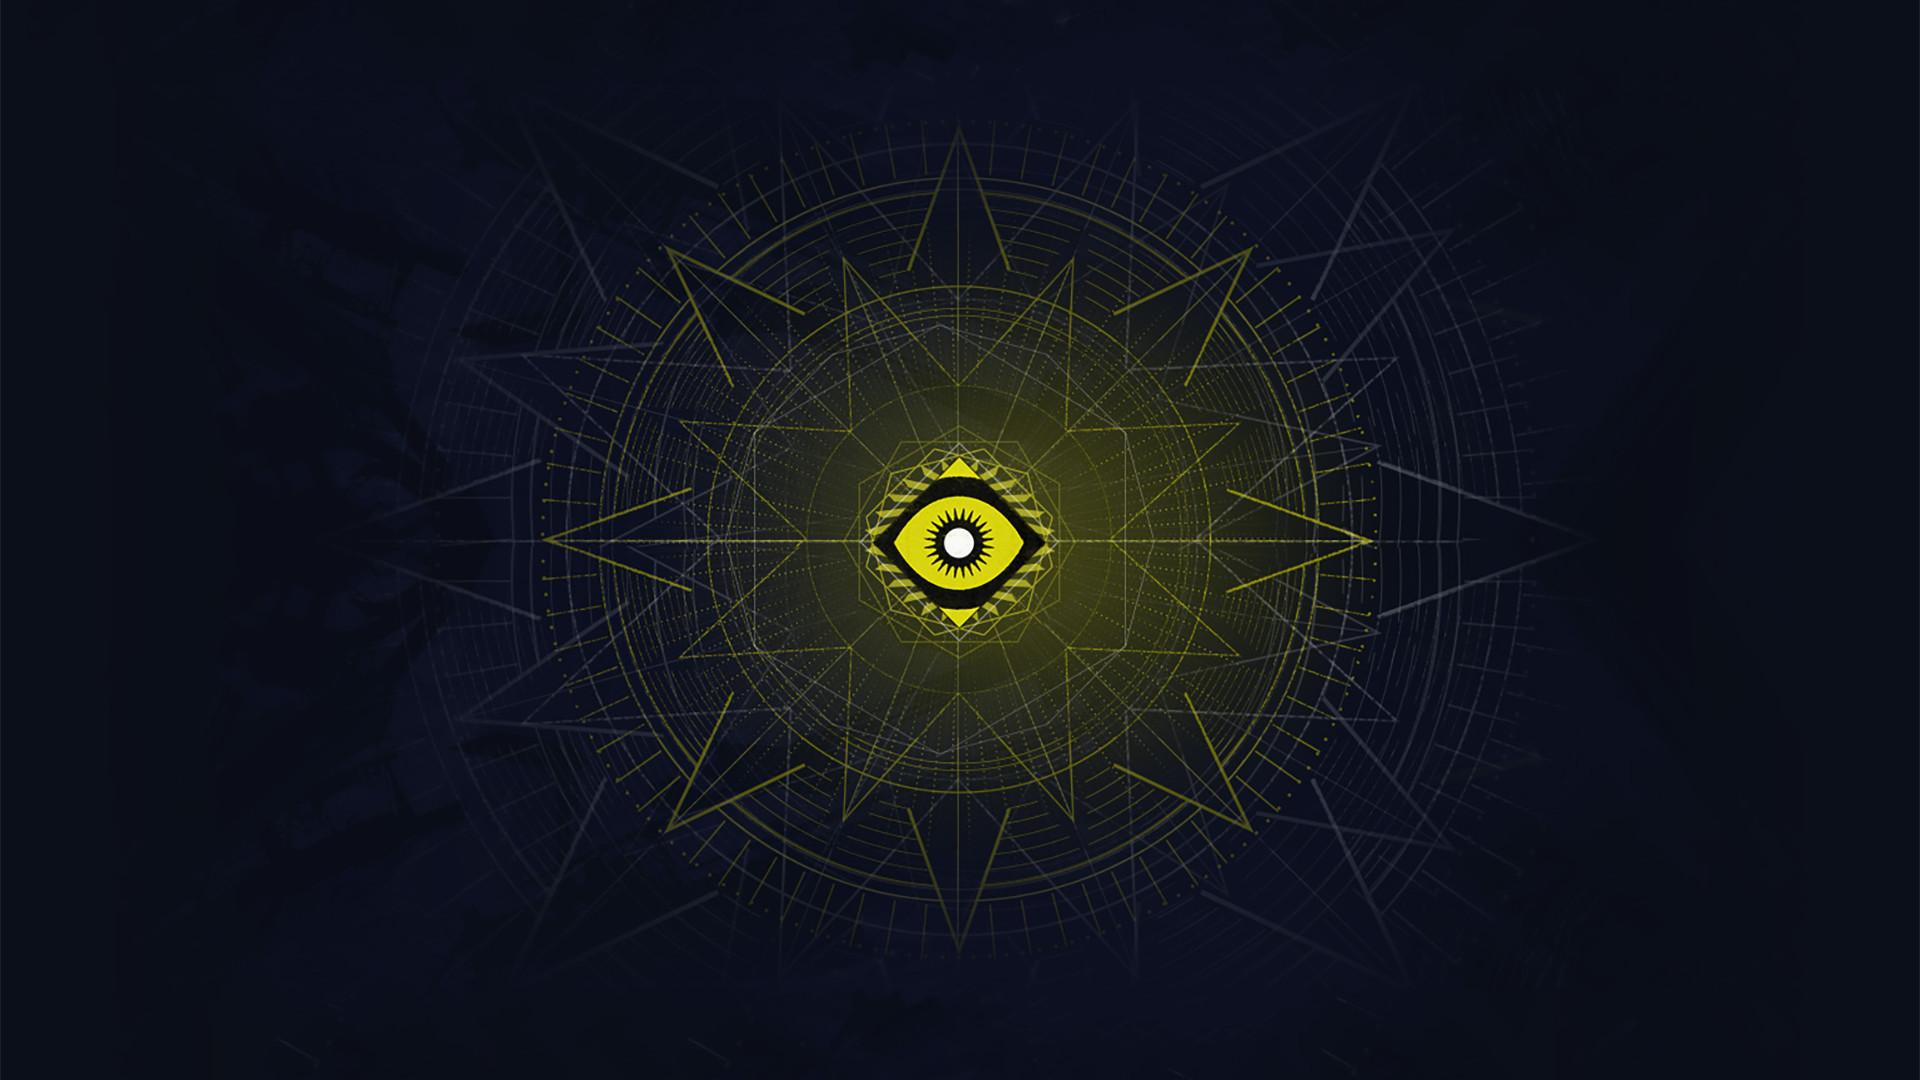 Trials of Osiris Wallpaper — > Destiny   Forums   Bungie.net